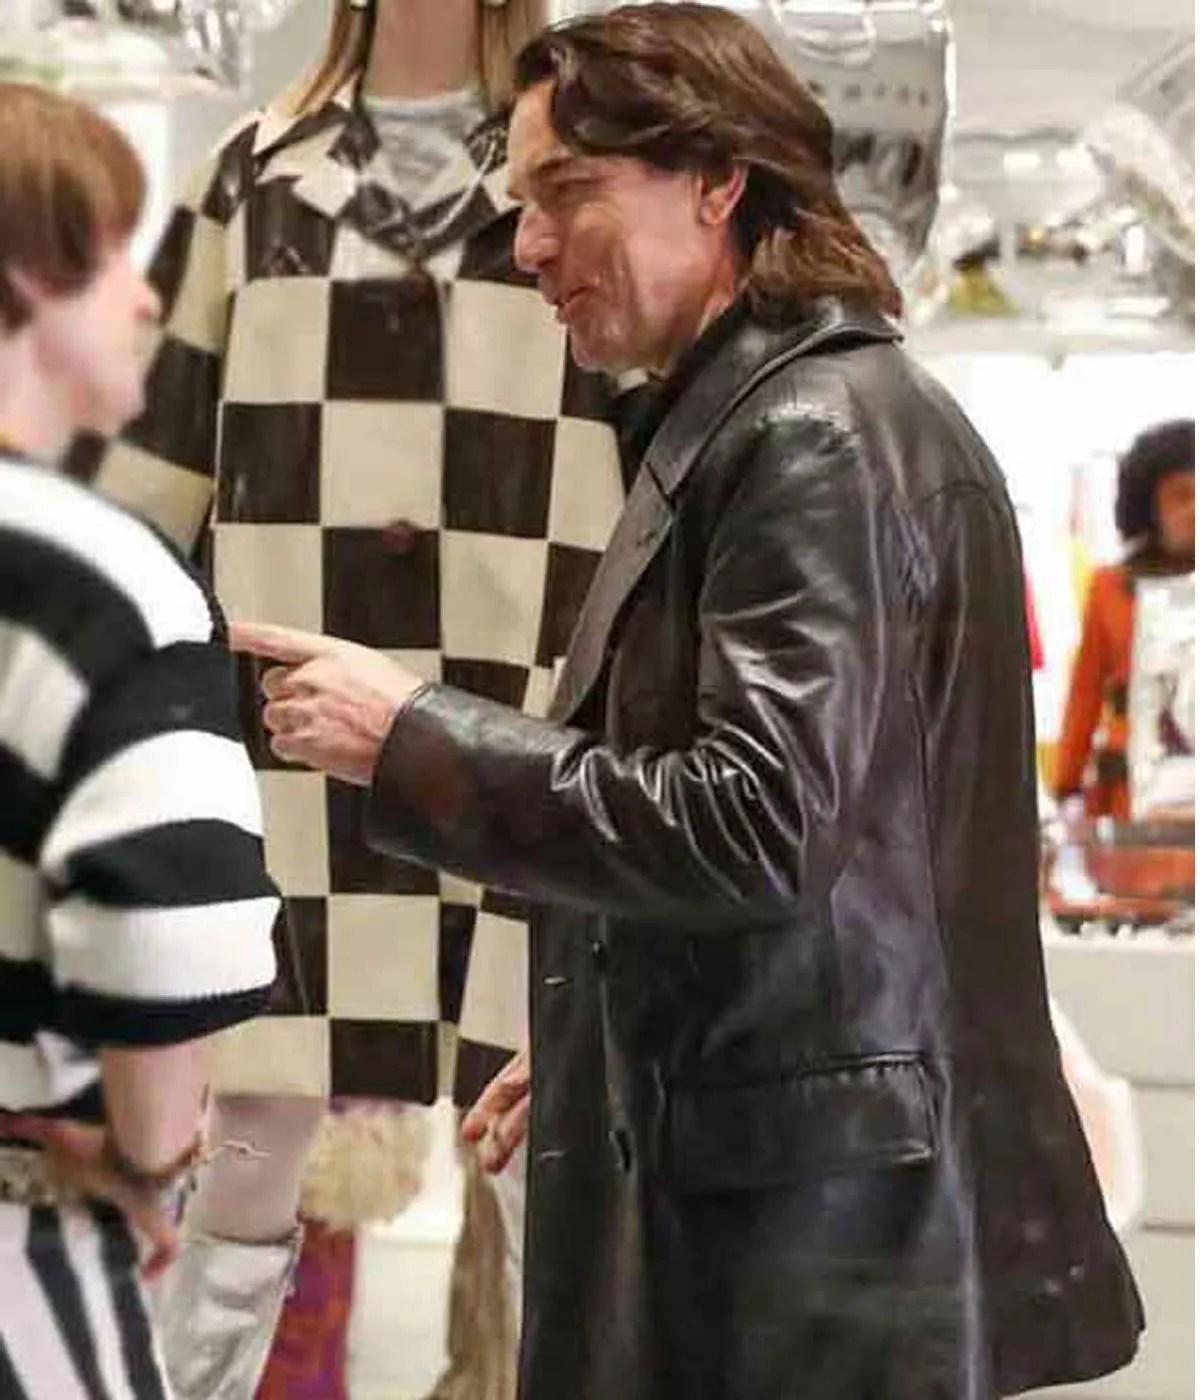 halston-ewan-mcgregor-leather-peacoat